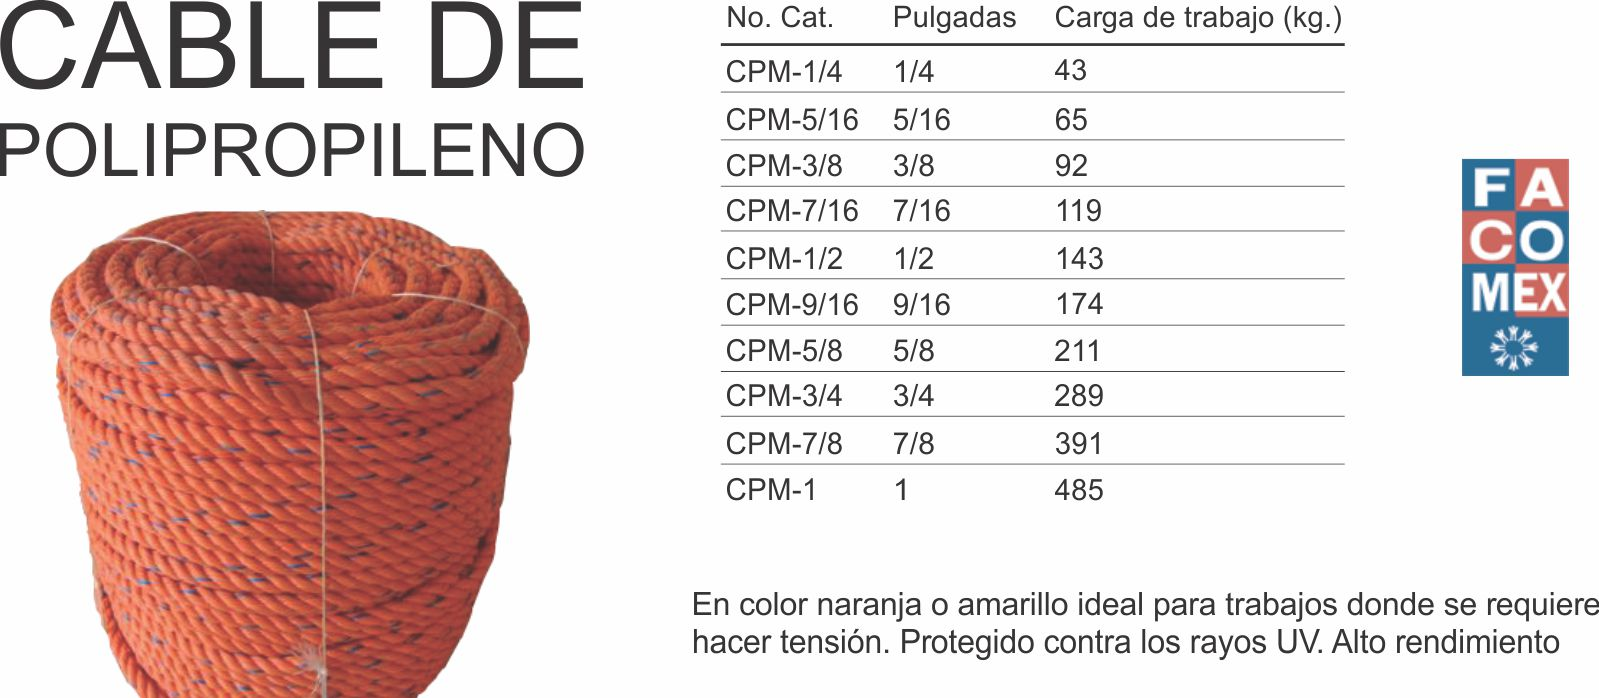 Cable prolipropileno